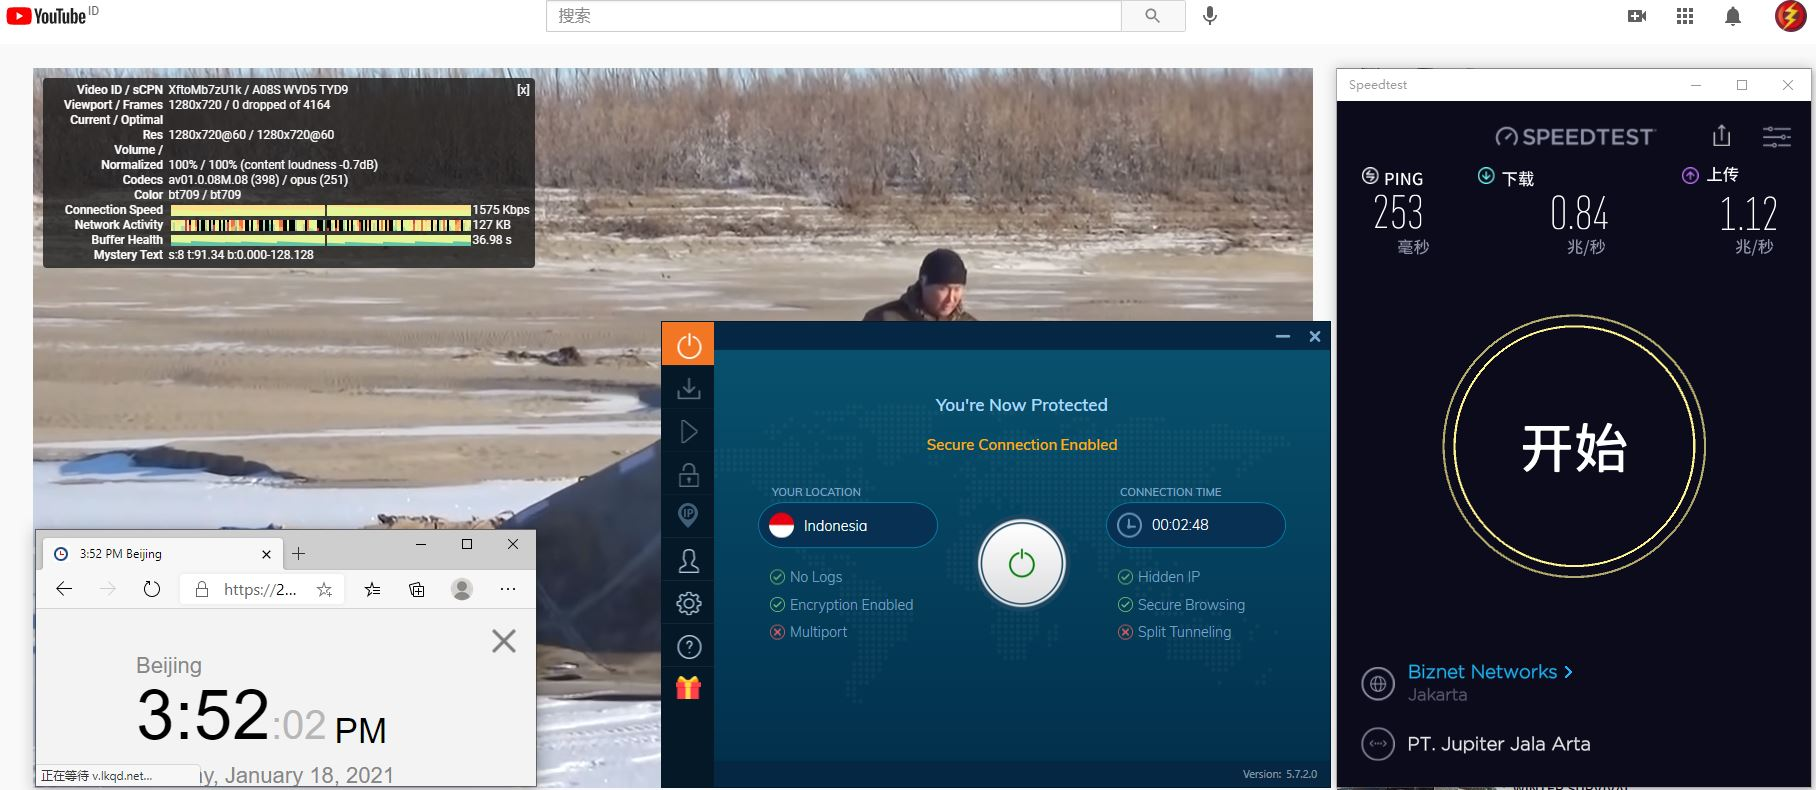 Windows10 IvacyVPN IKEv2 indonesia 服务器 中国VPN 翻墙 科学上网 10BEASTS Barry测试 - 20210118